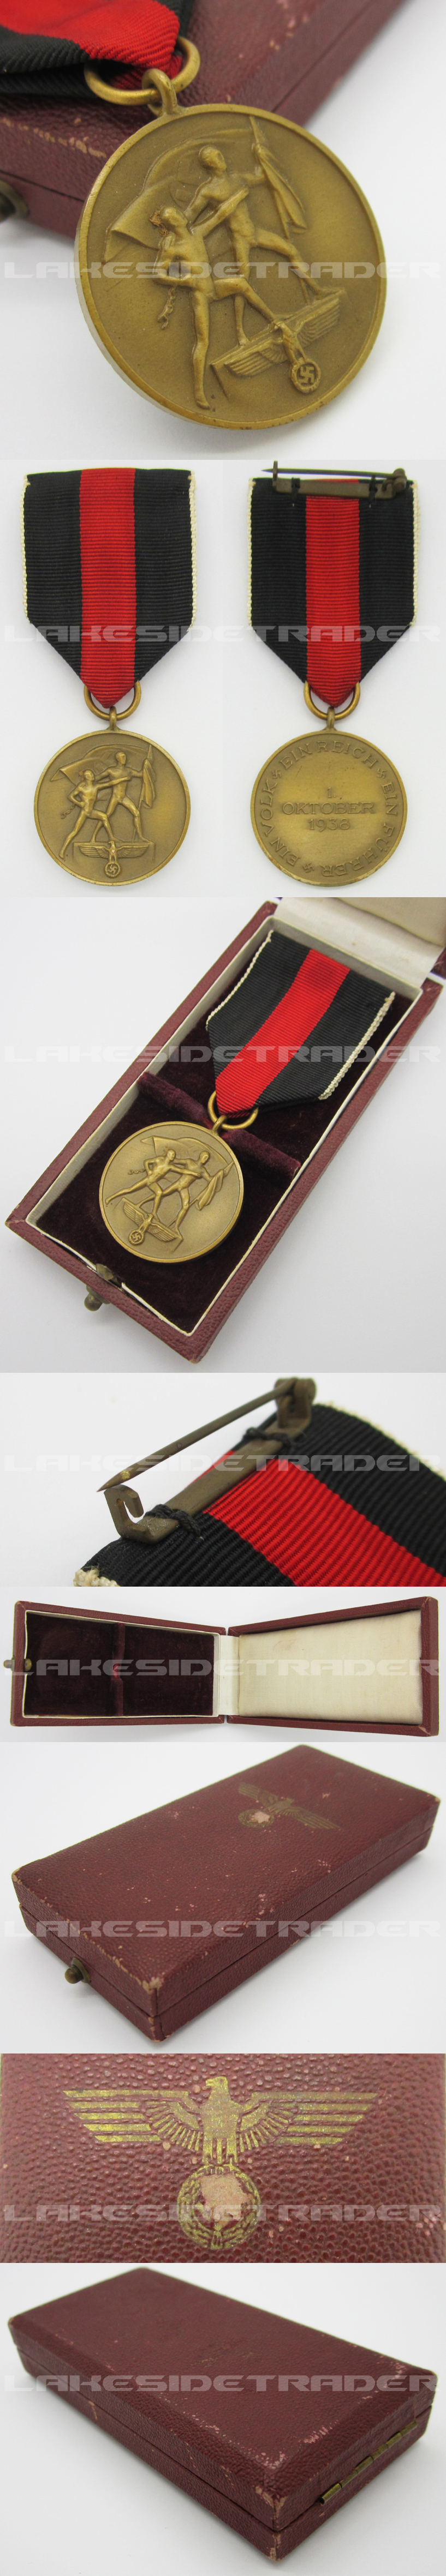 Cased Sudetenland Commemorative Medal